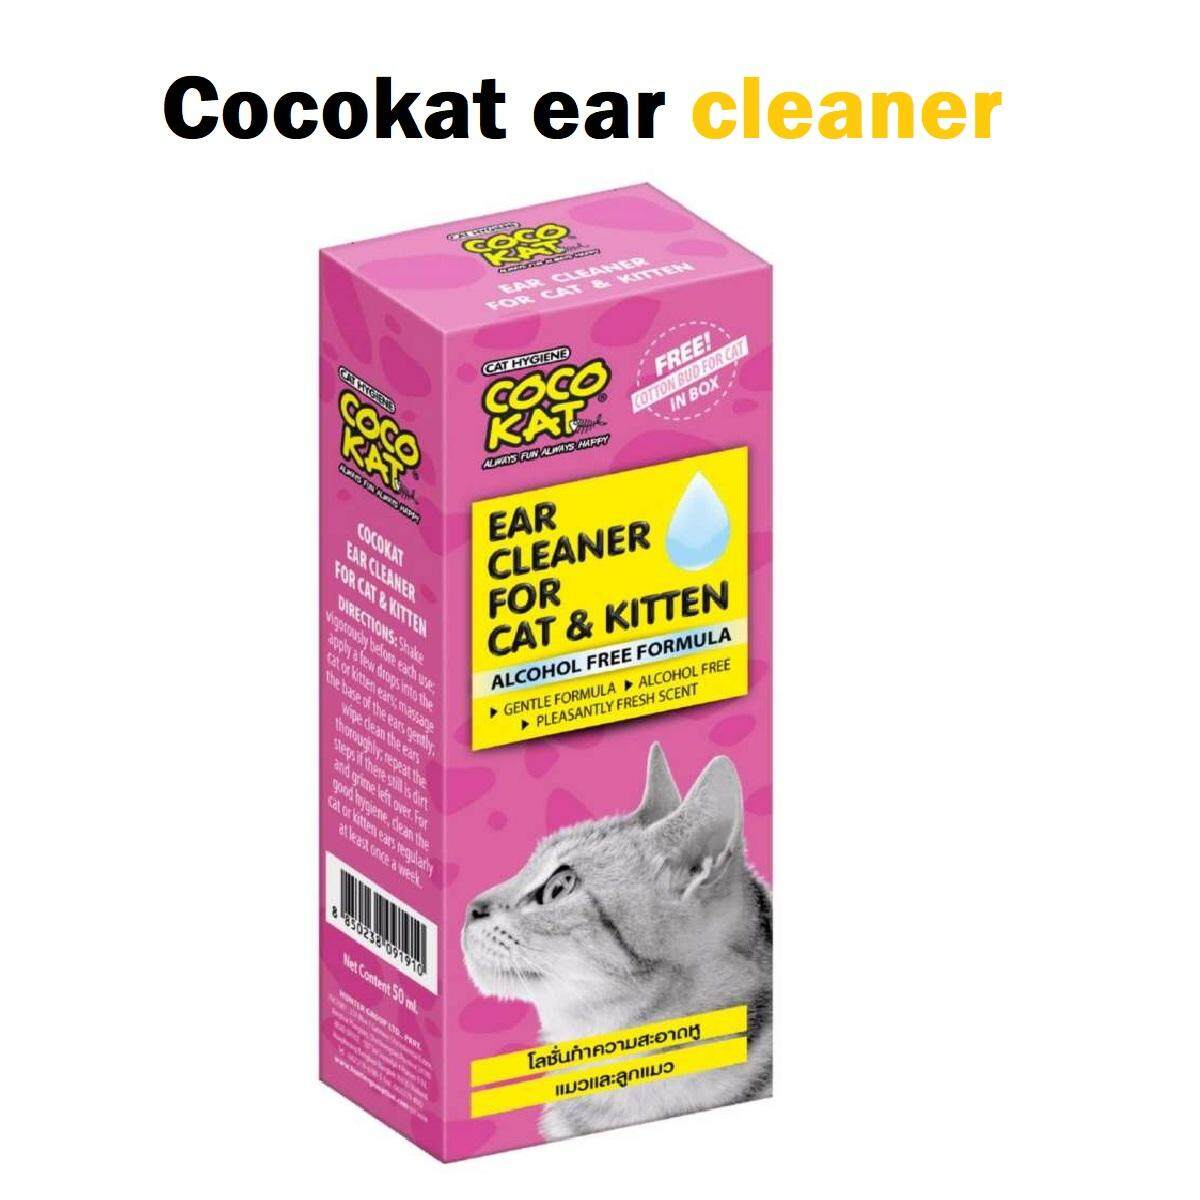 Cocokat Ear Cleaner น้ำยาเช็ด หู แมว 50ml.